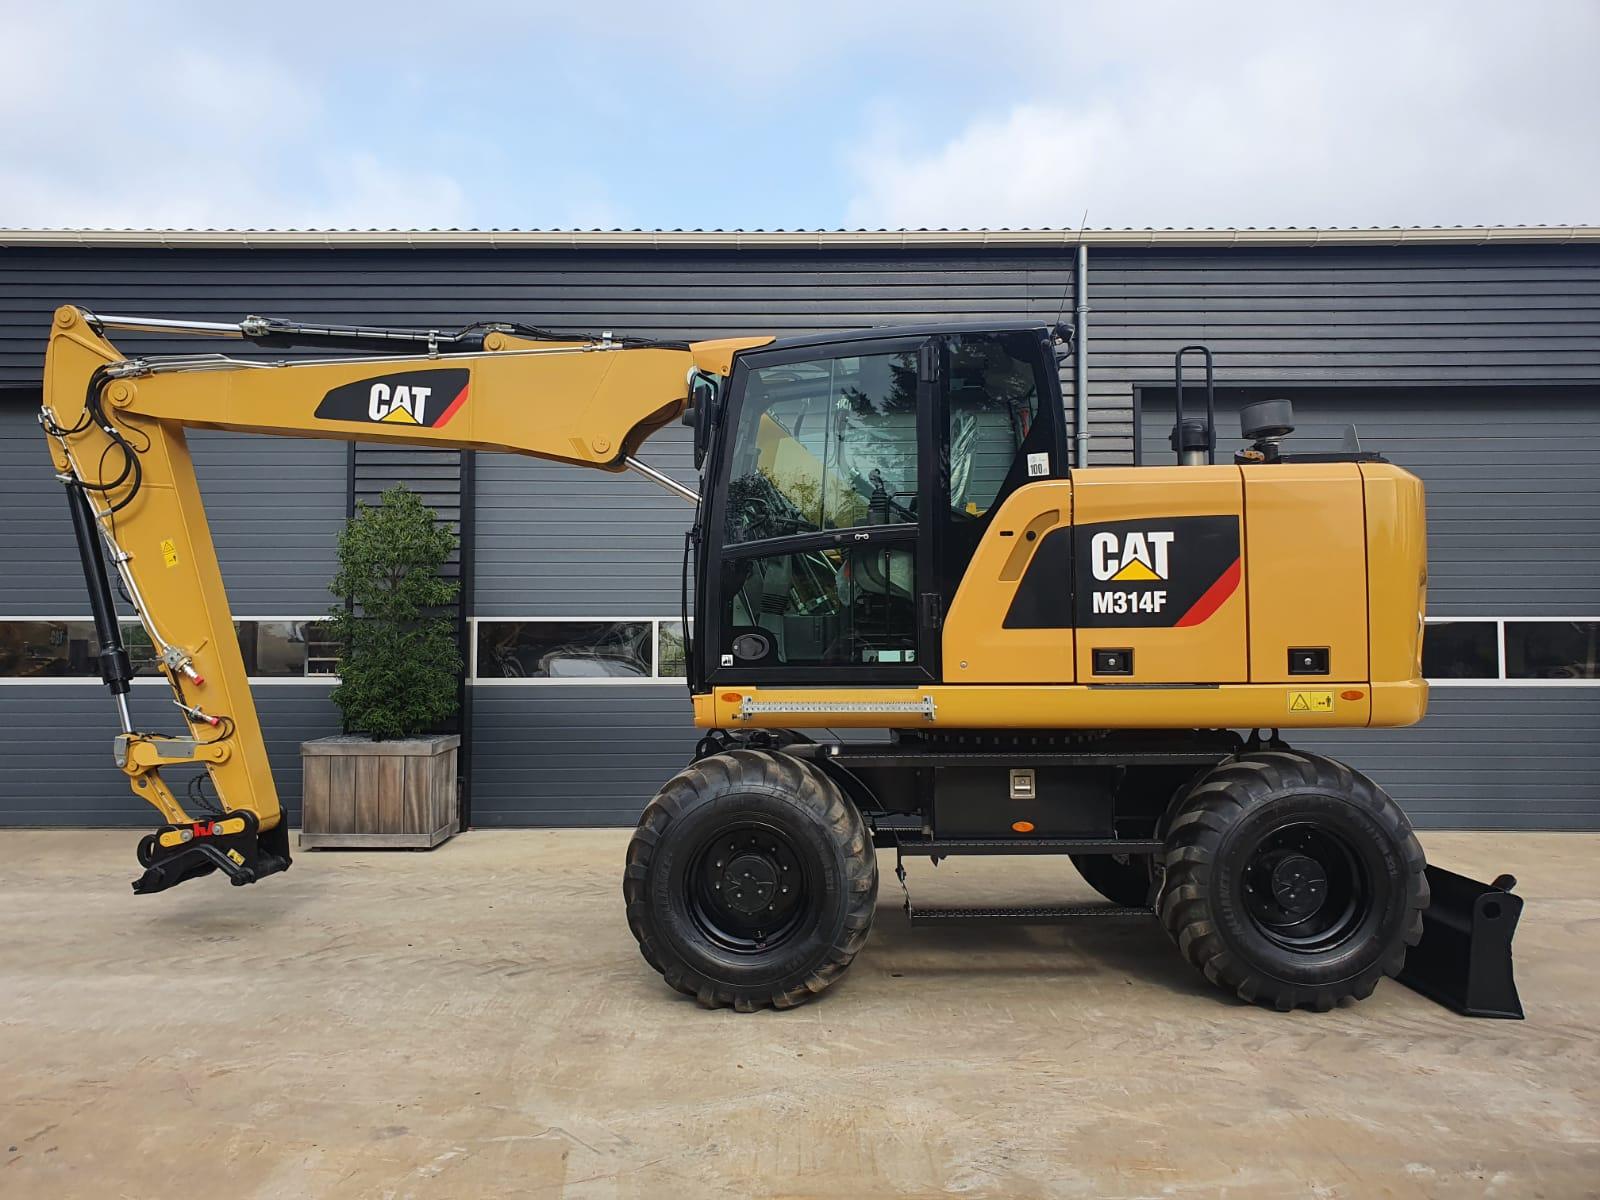 Caterpillar M314F Wheeled excavator